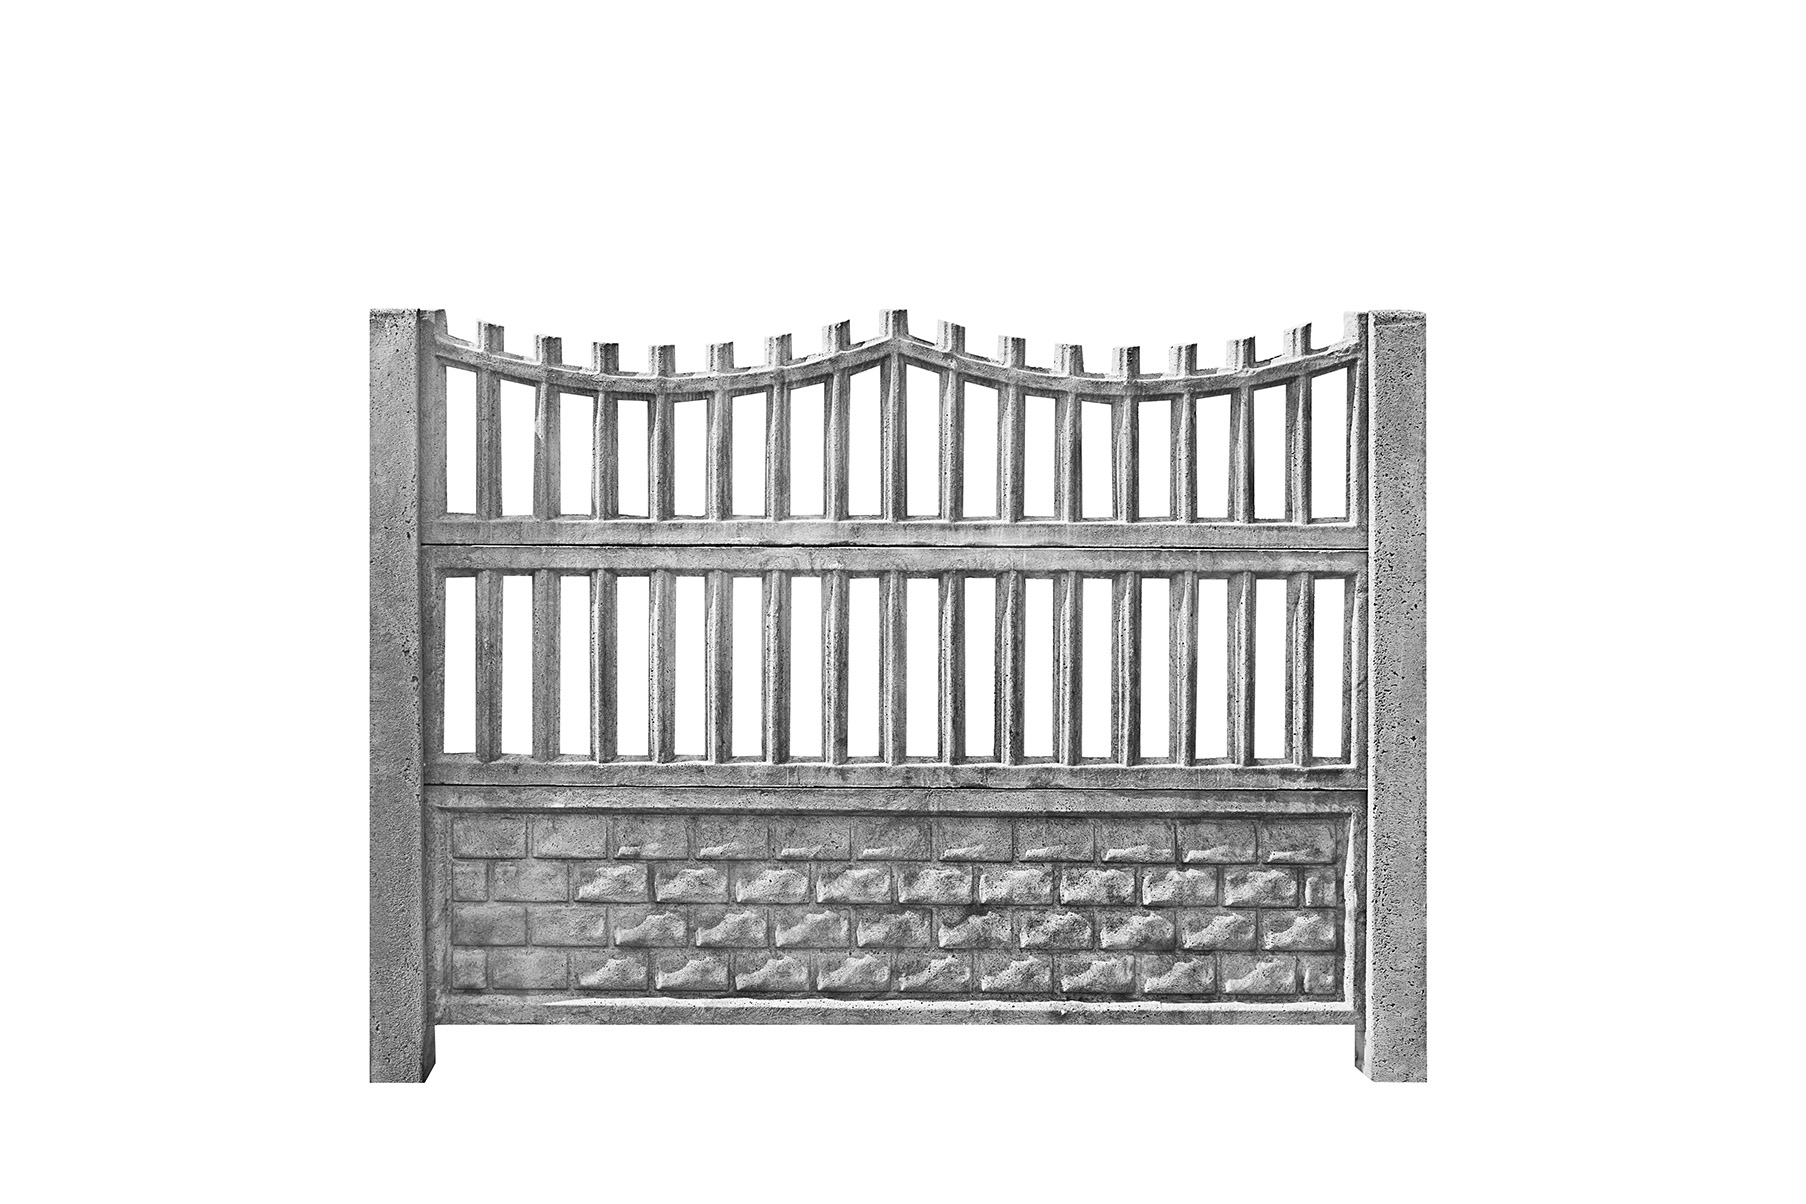 betónové ploty číslo modelu 6